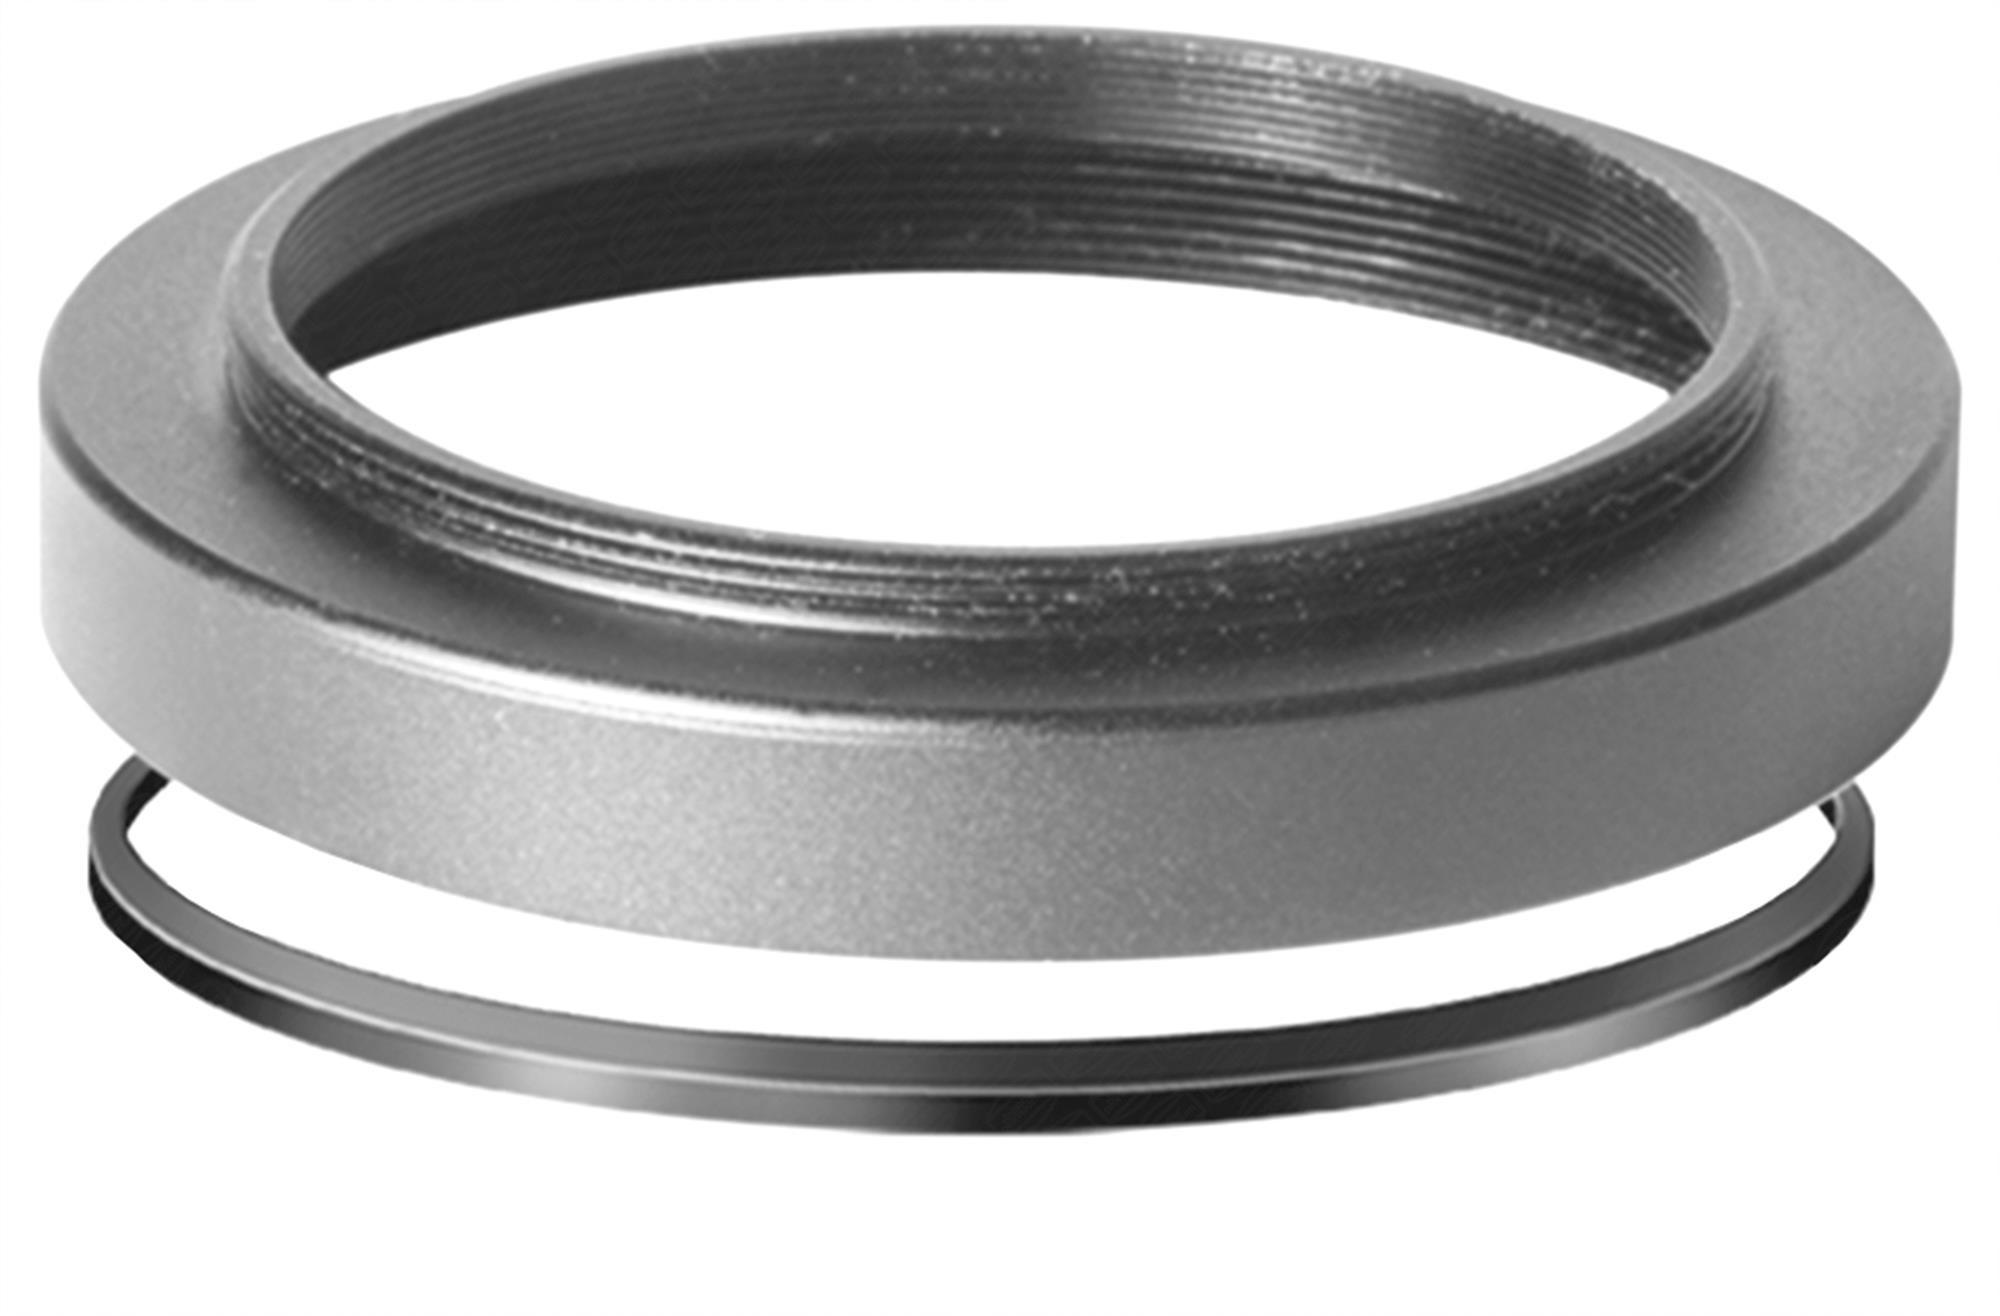 Hyperion DT Ring SP54/M46